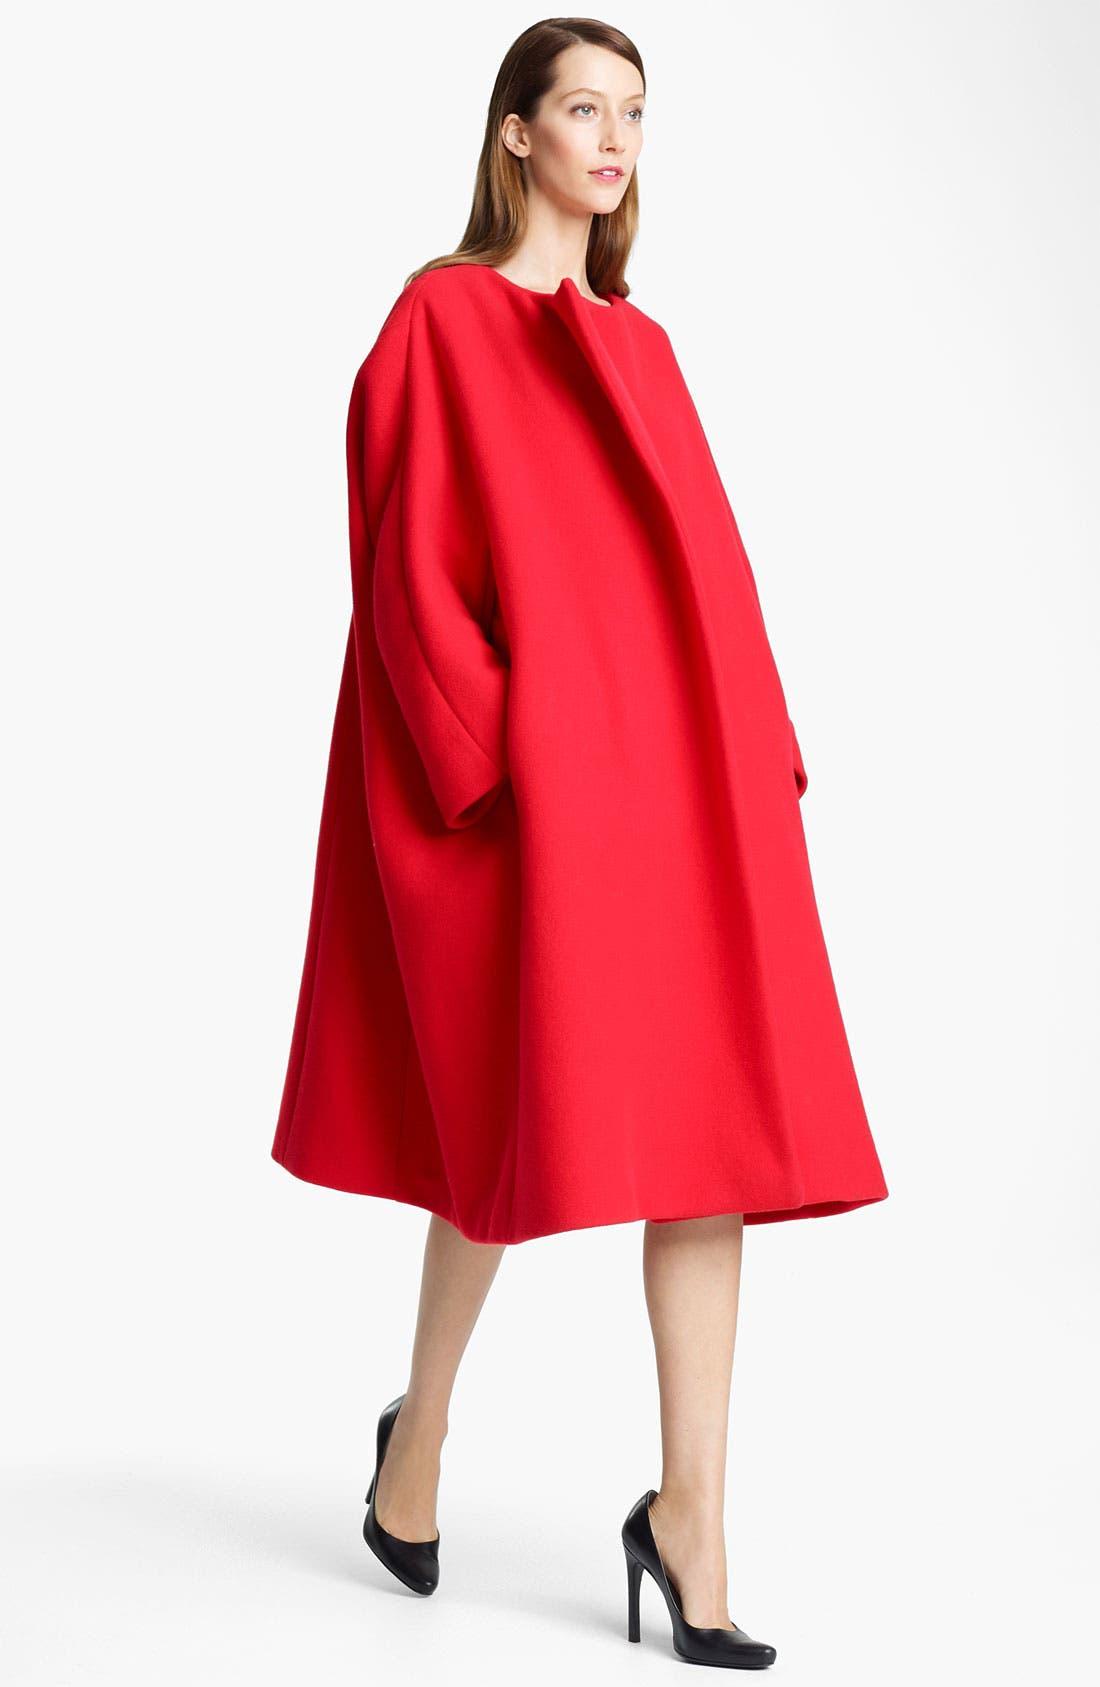 Alternate Image 1 Selected - Jil Sander Oversized Double Face Melton Wool Coat